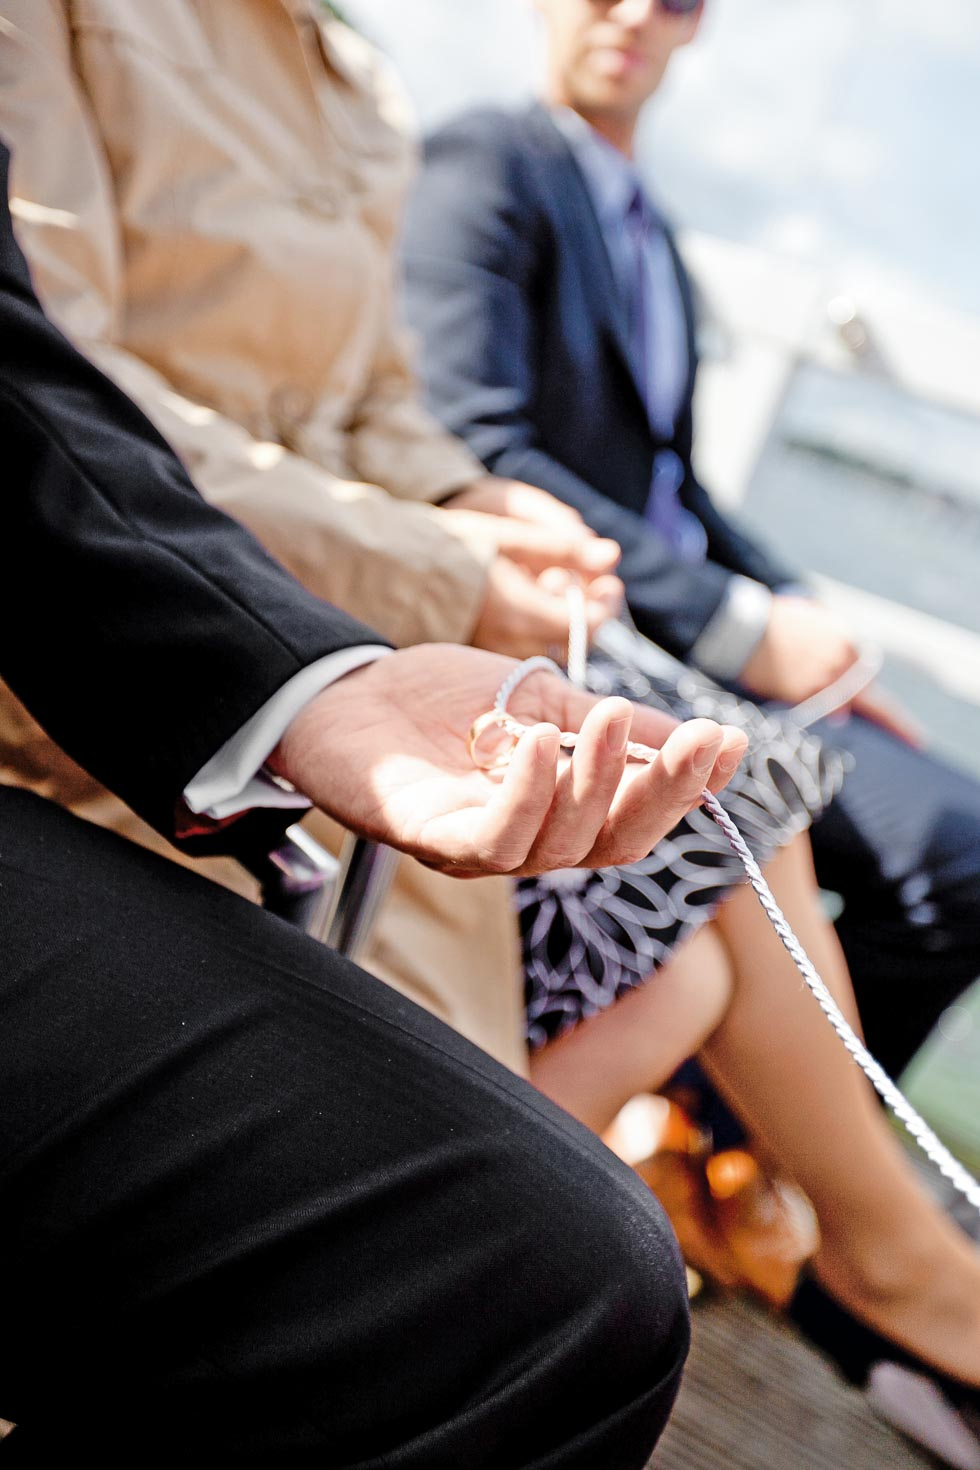 Hochzeitsritual Trauung Ringe segnen